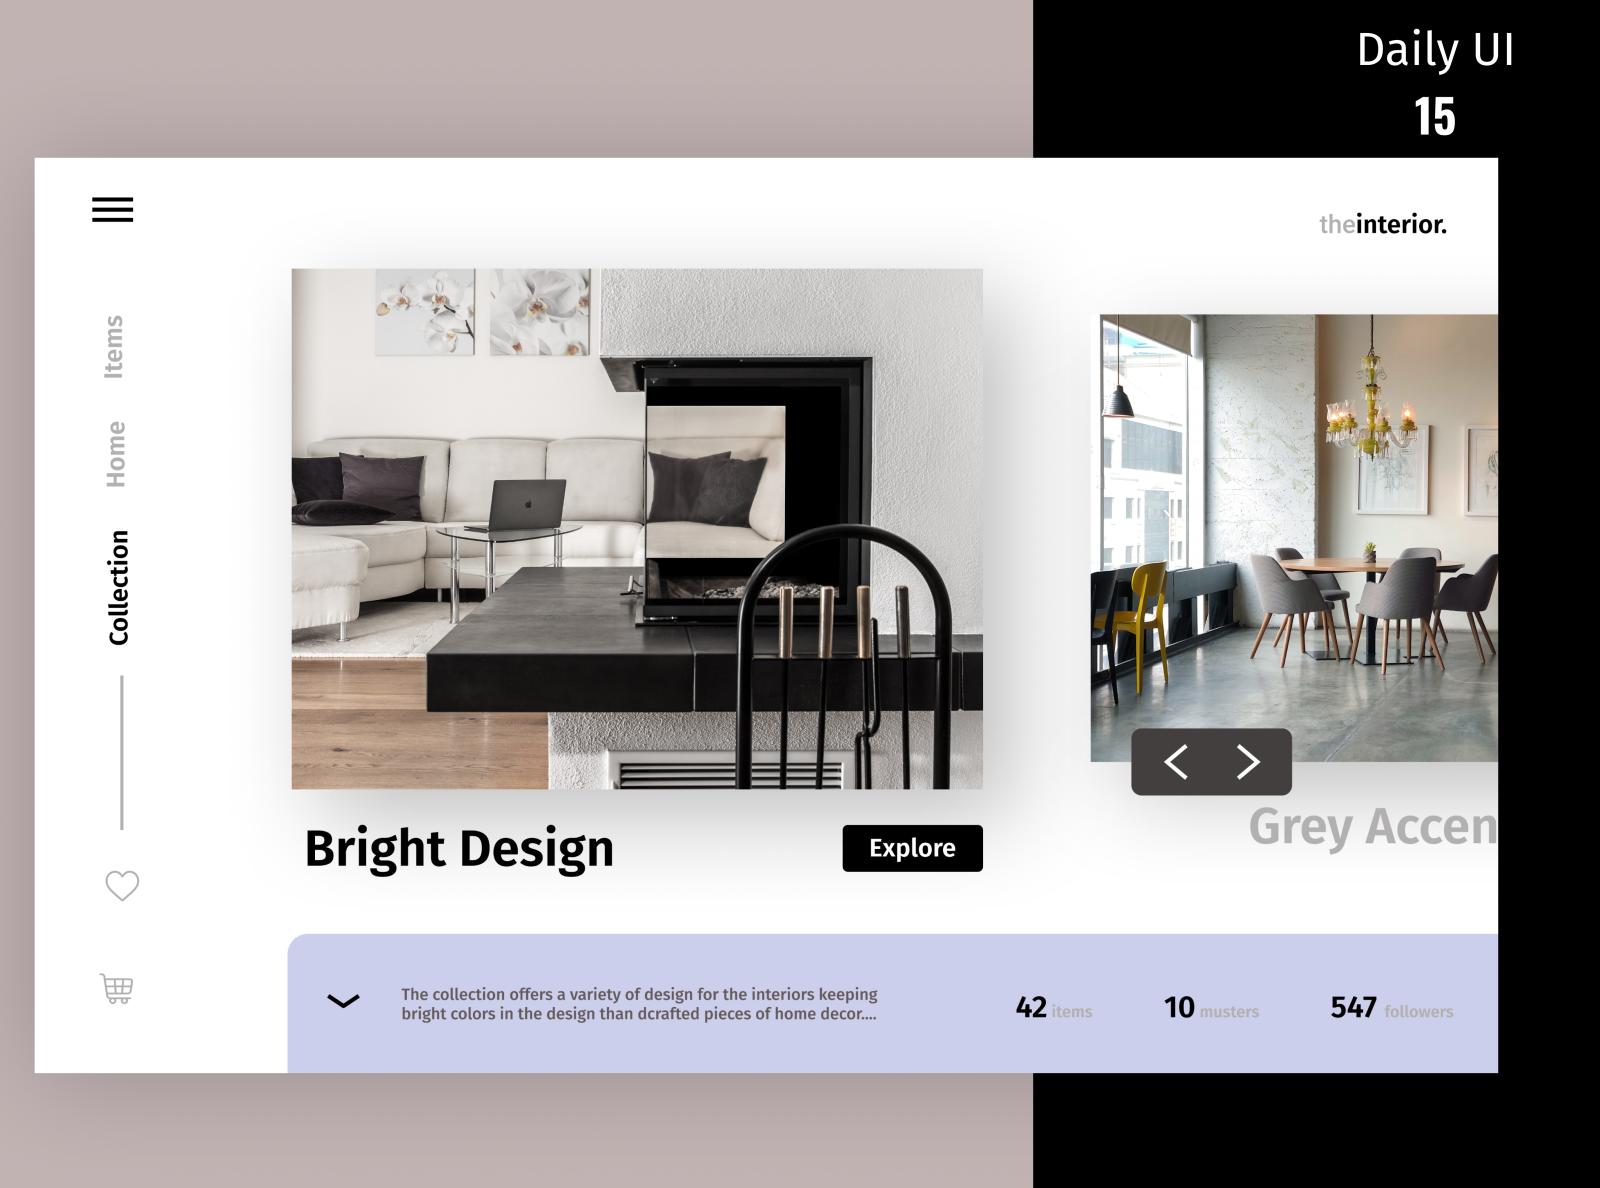 Home Decor Website Design Concept By Satya Ranjan Swain On Dribbble